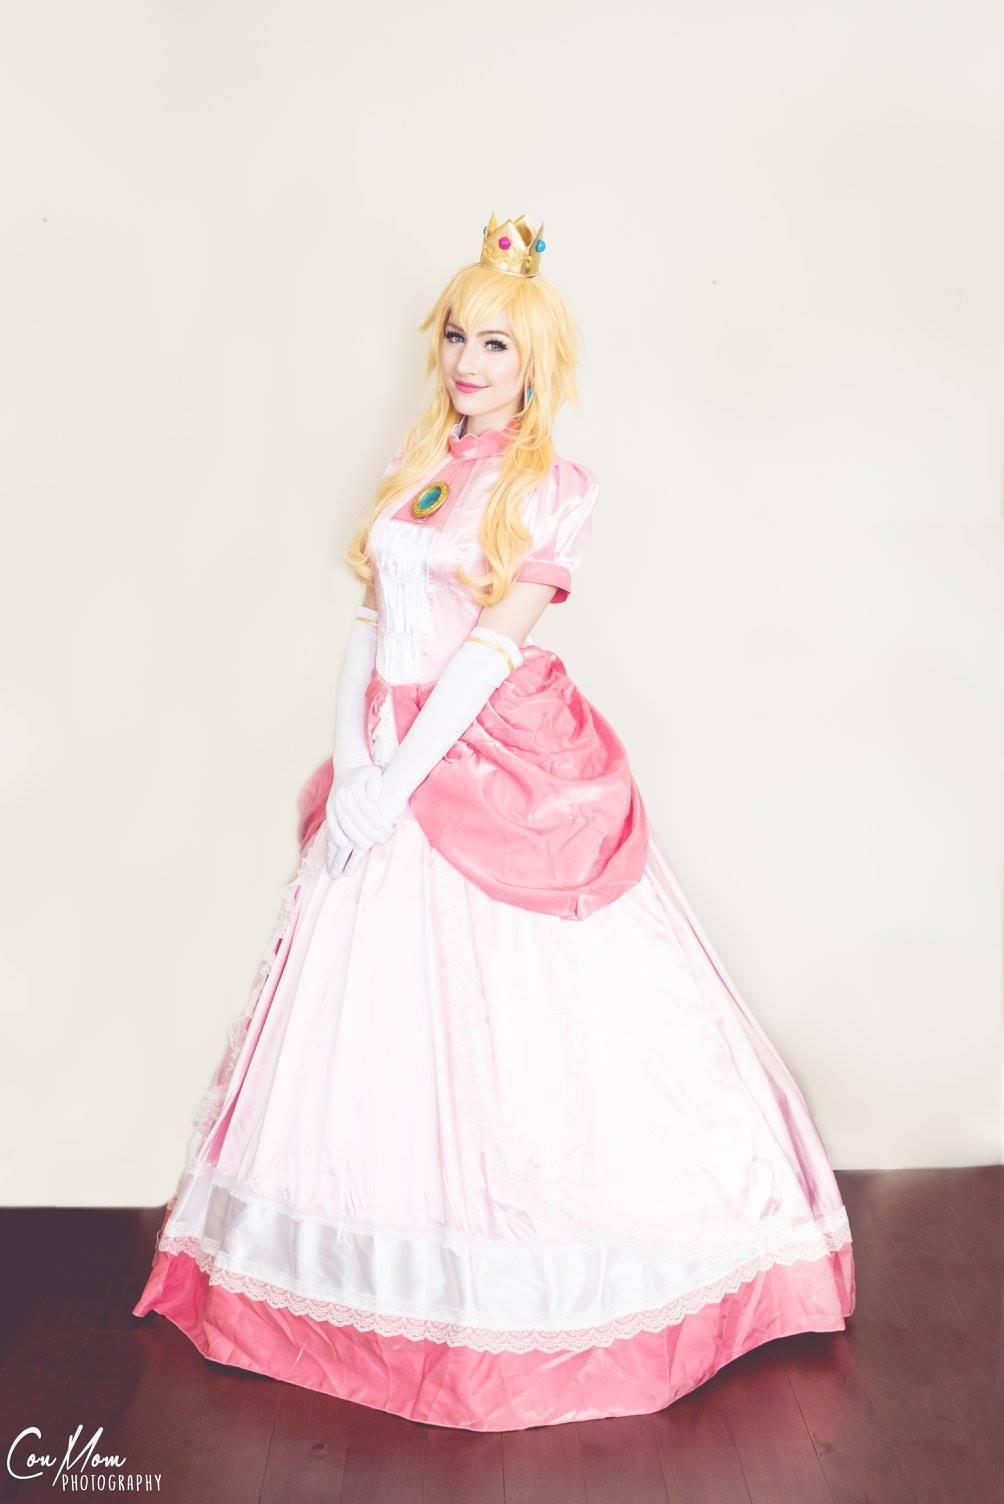 Luxlo Cosplay as Princess Peach 2